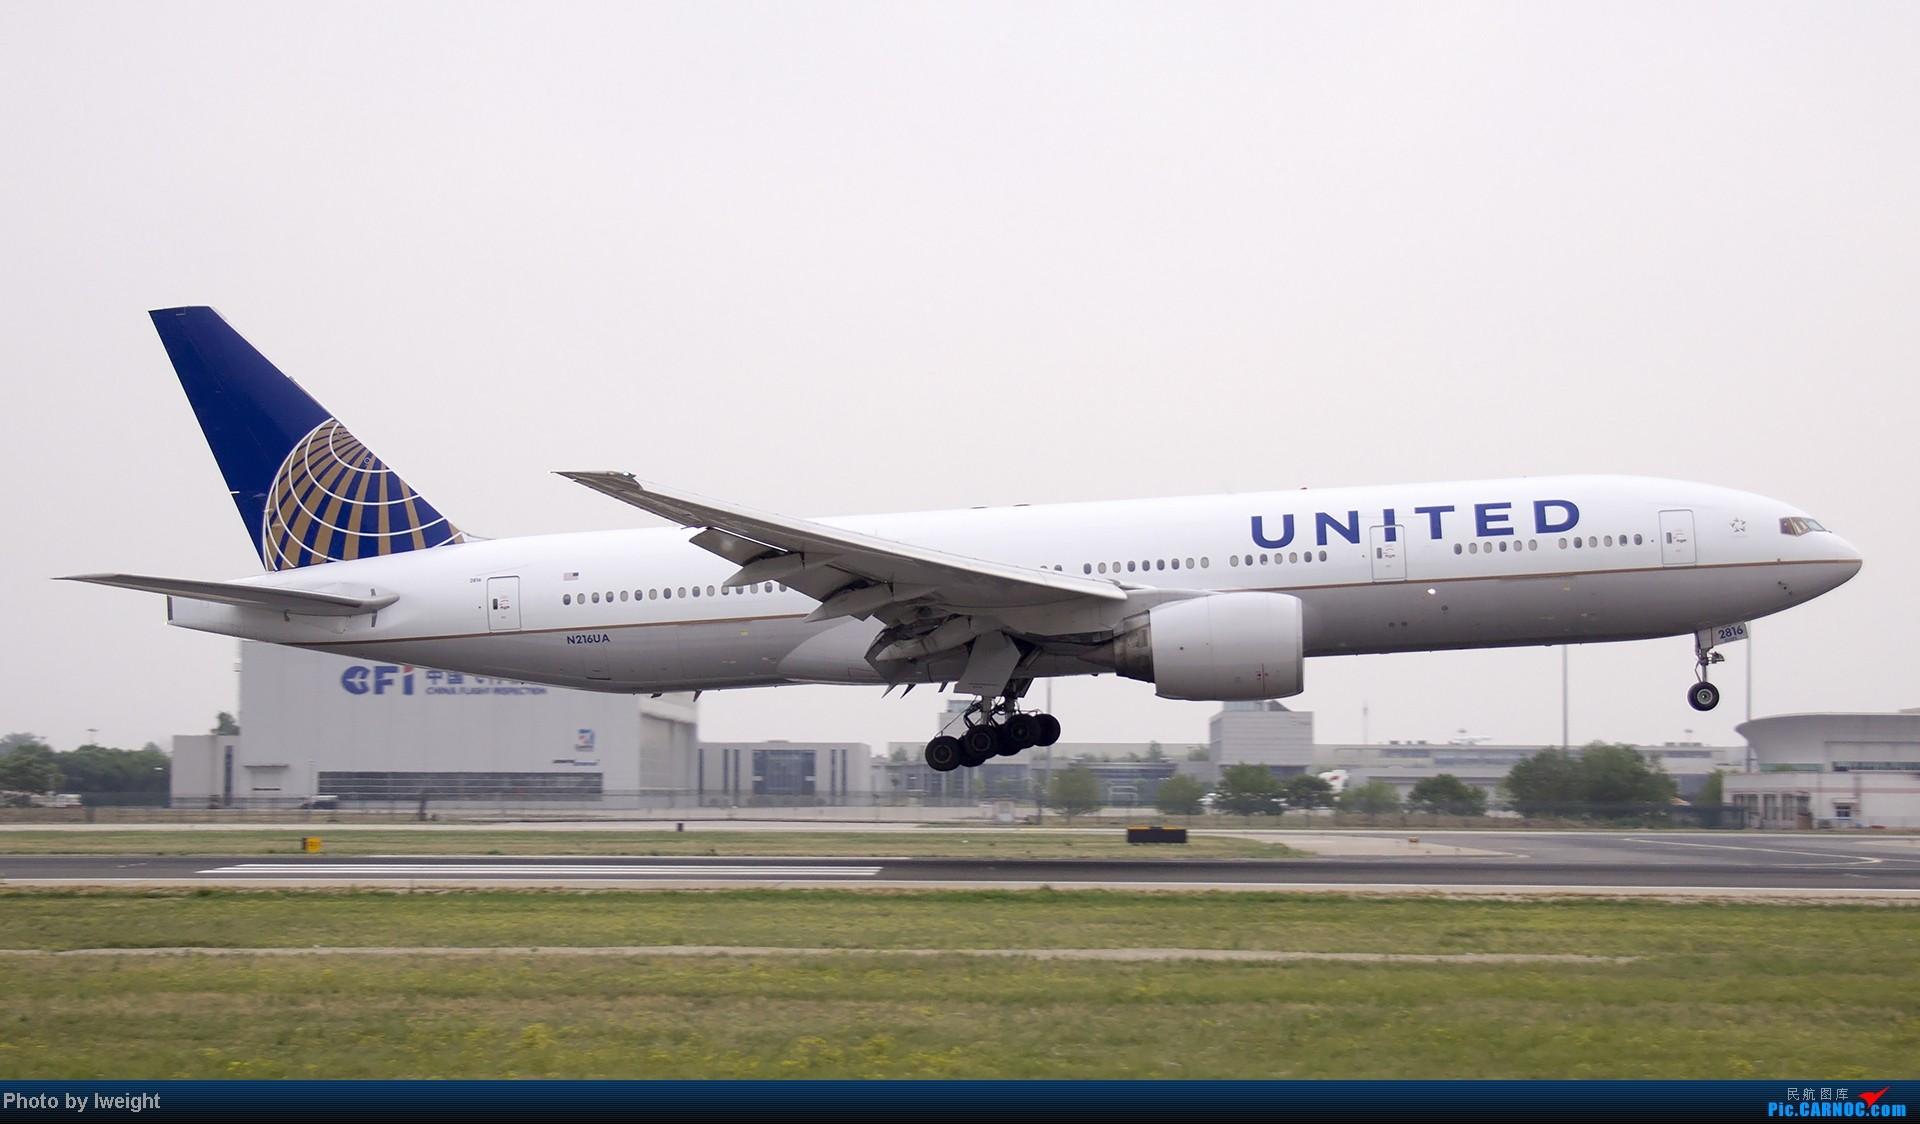 Re:[原创]5月3日首都机场风云变幻的下午 BOEING 777-200 N216UA 中国北京首都机场